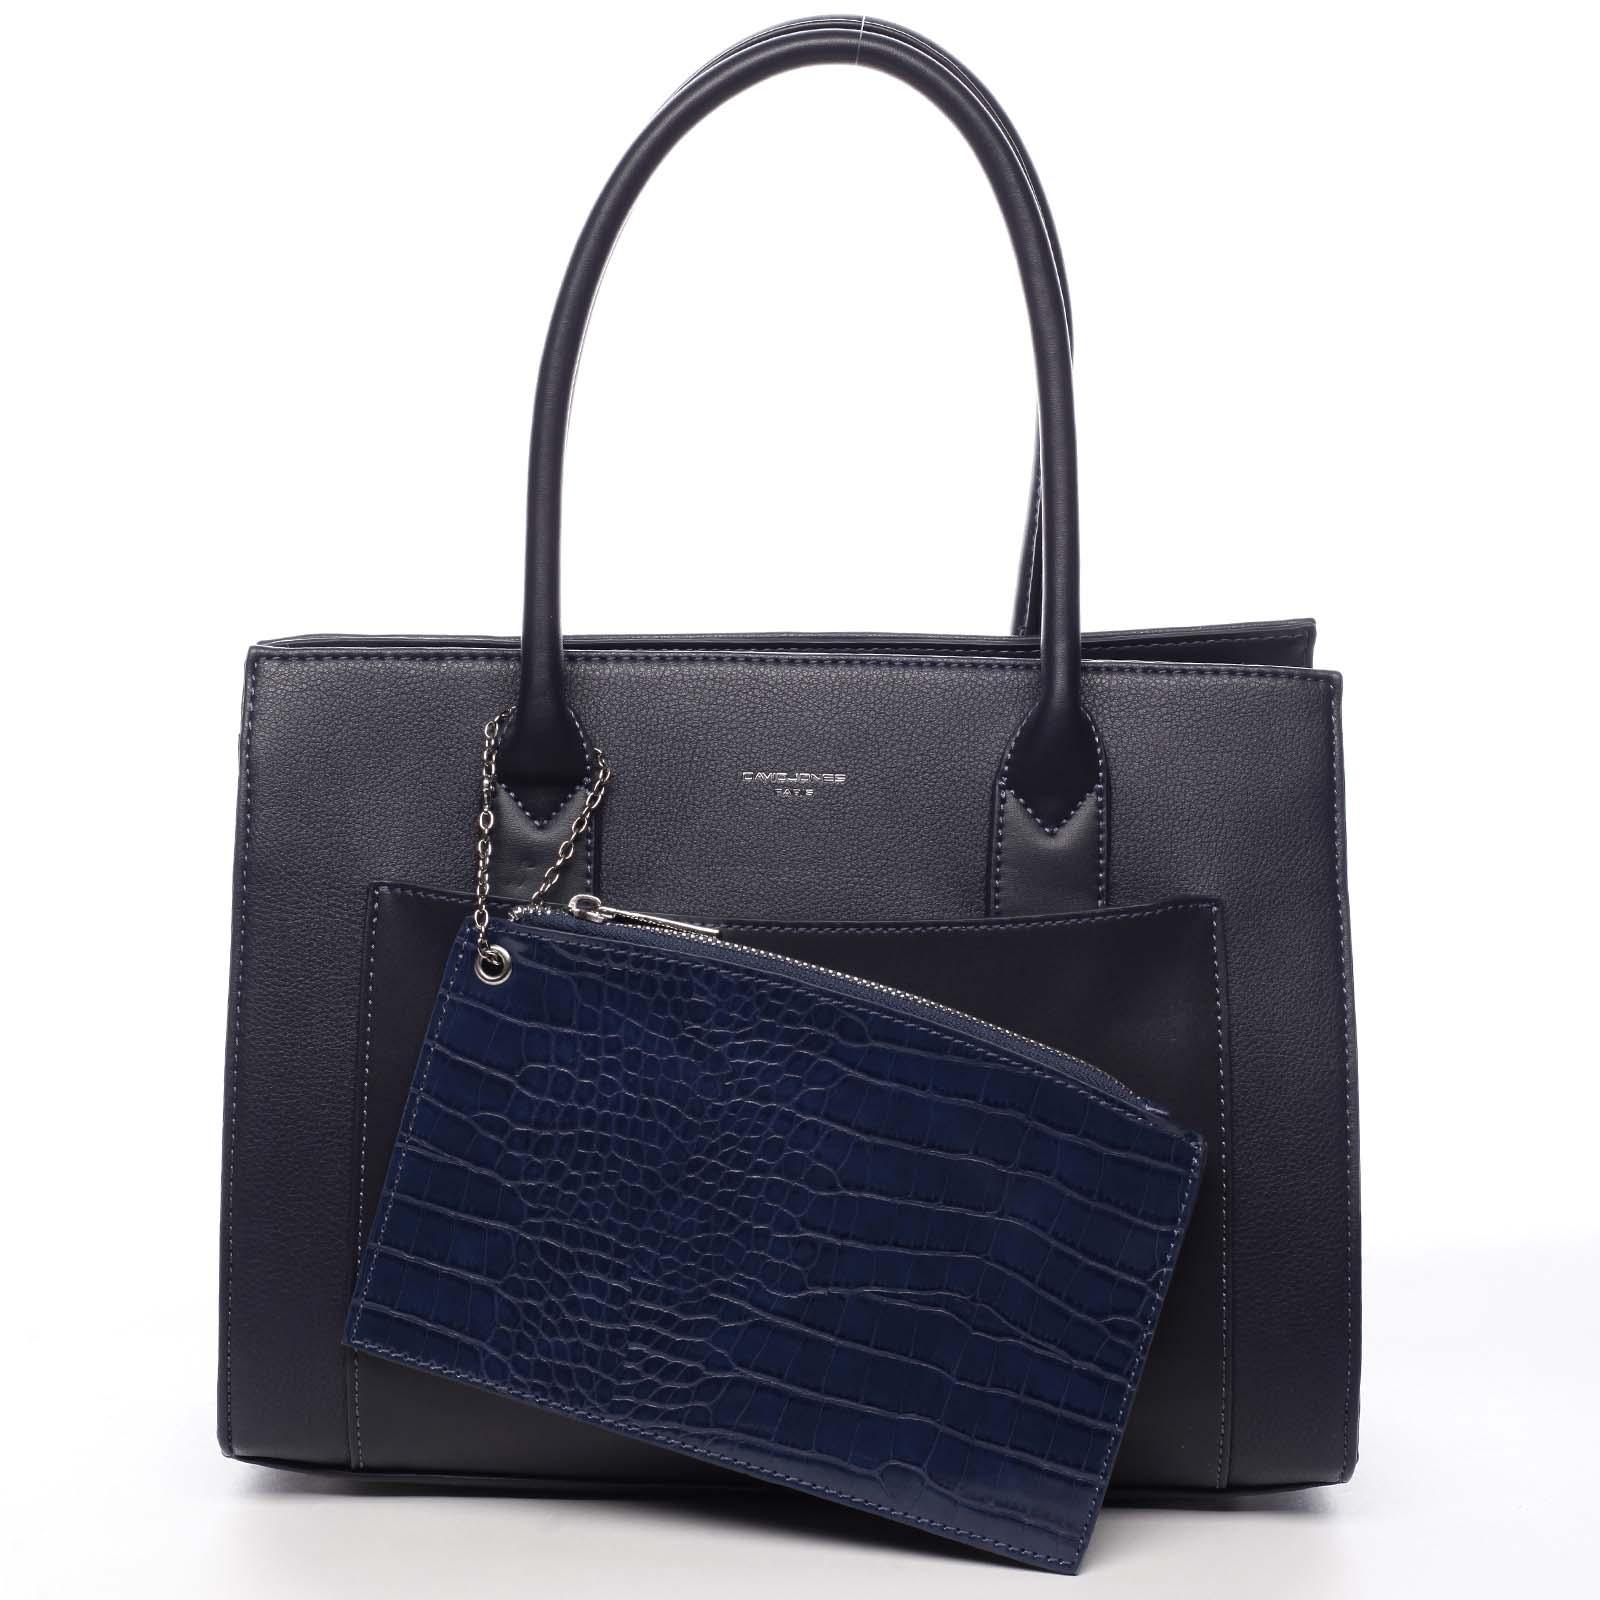 Dámska kabelka cez rameno tmavo modrá - David Jones Gilsia modrá